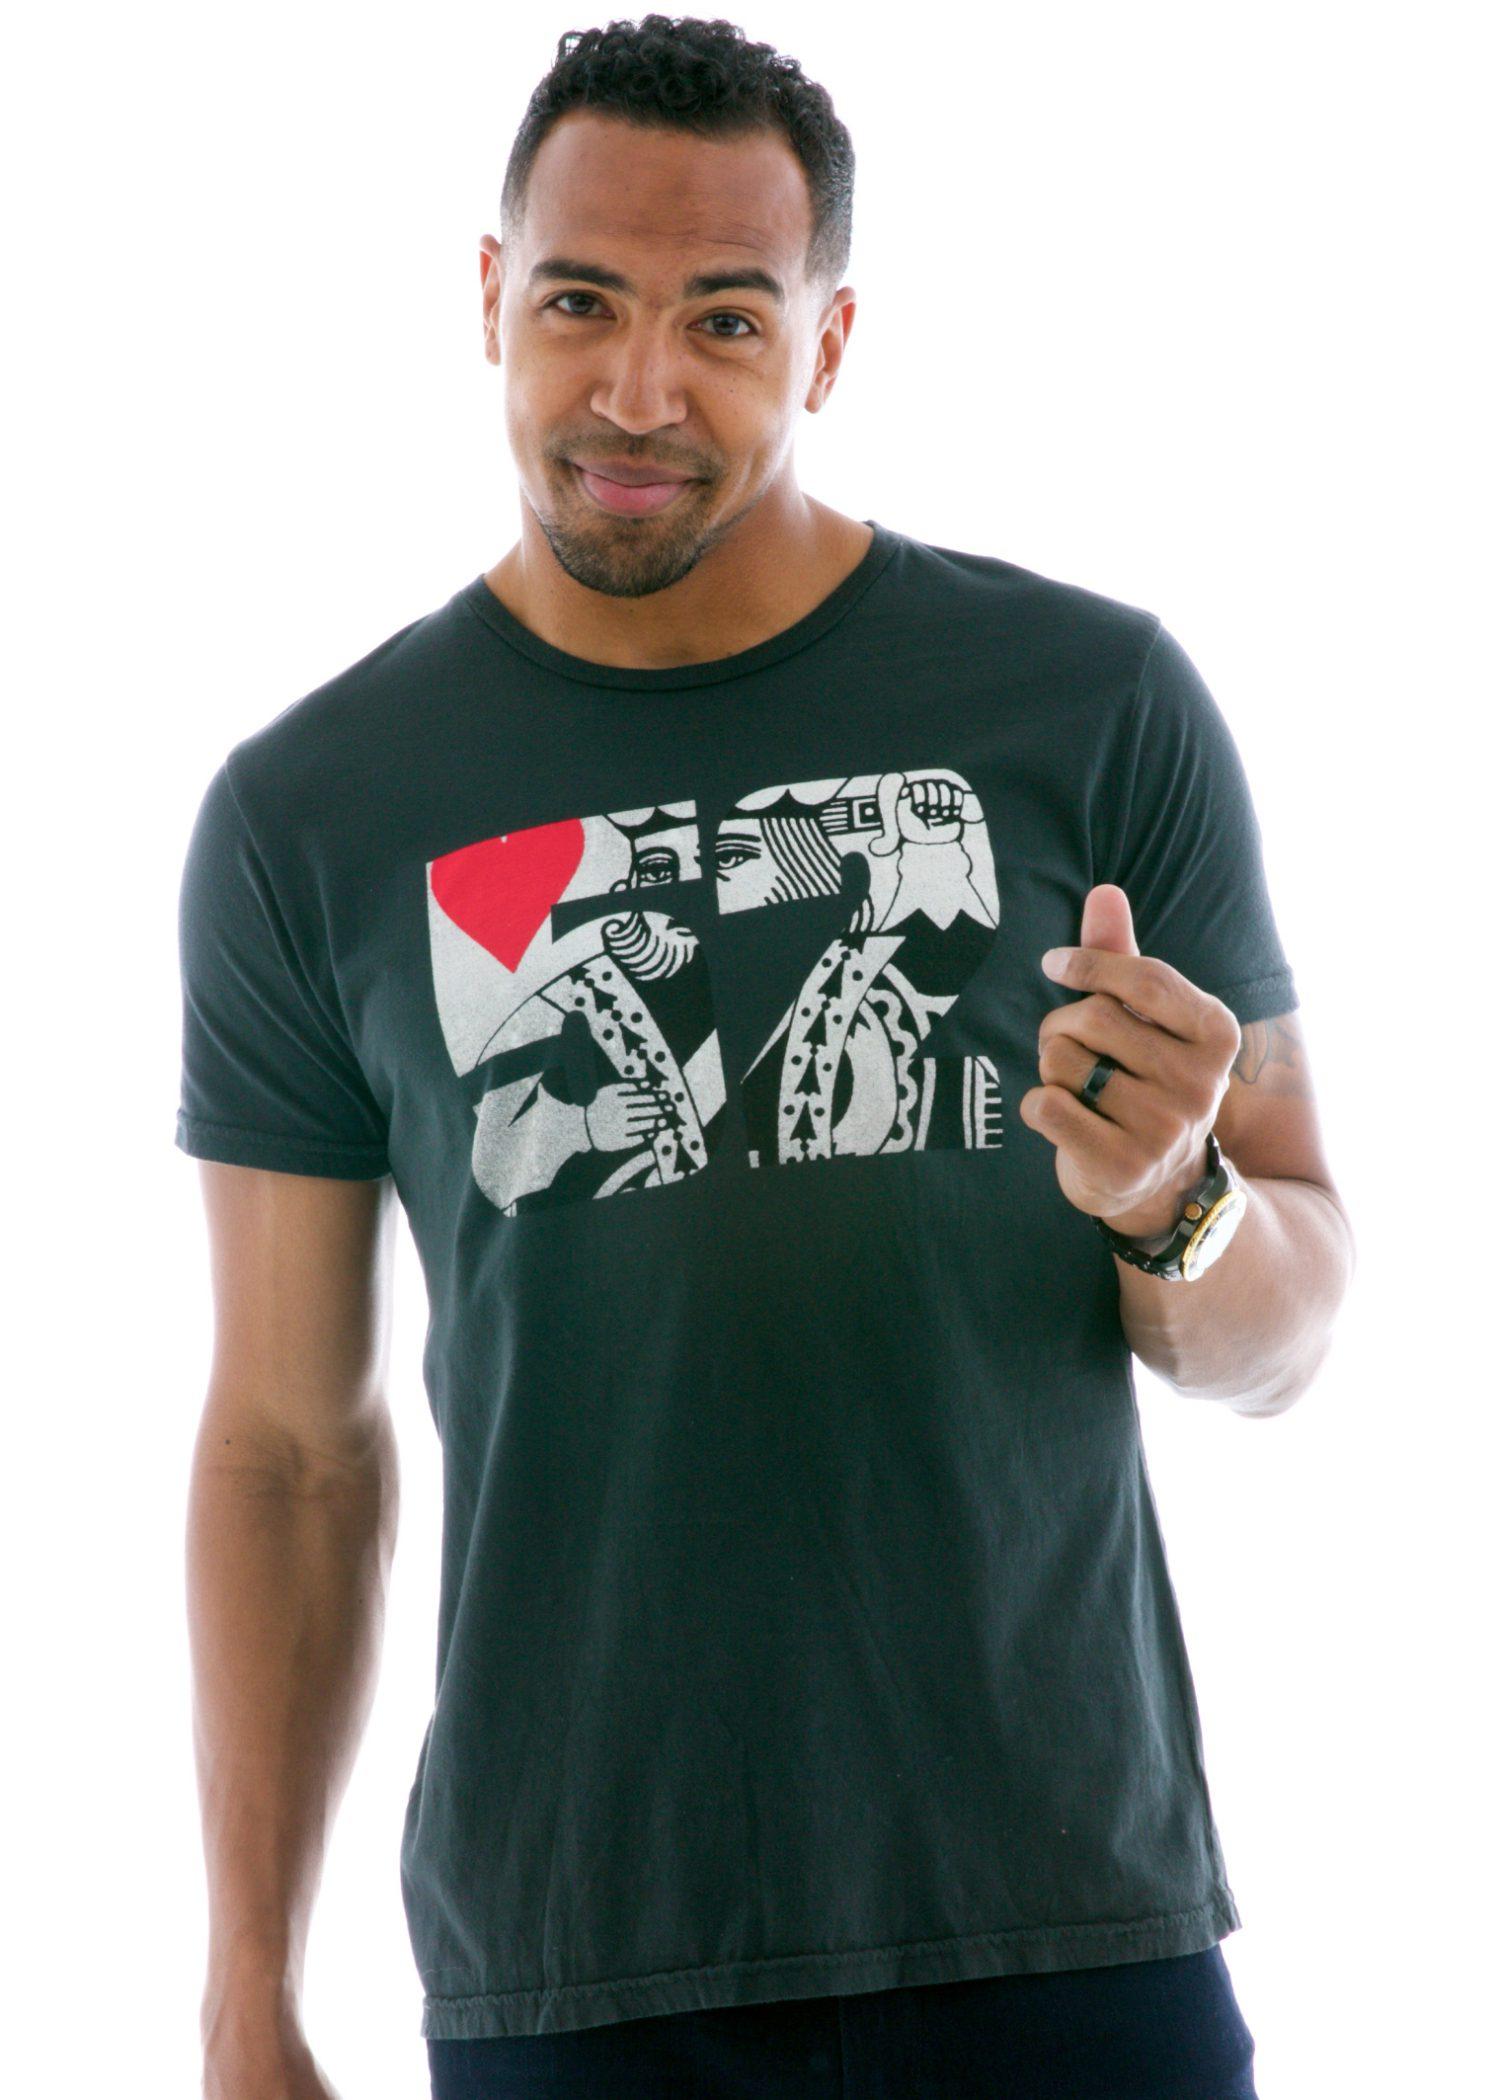 Men's Superfine Jersey Fashion Crew Short Sleeve T-Shirt